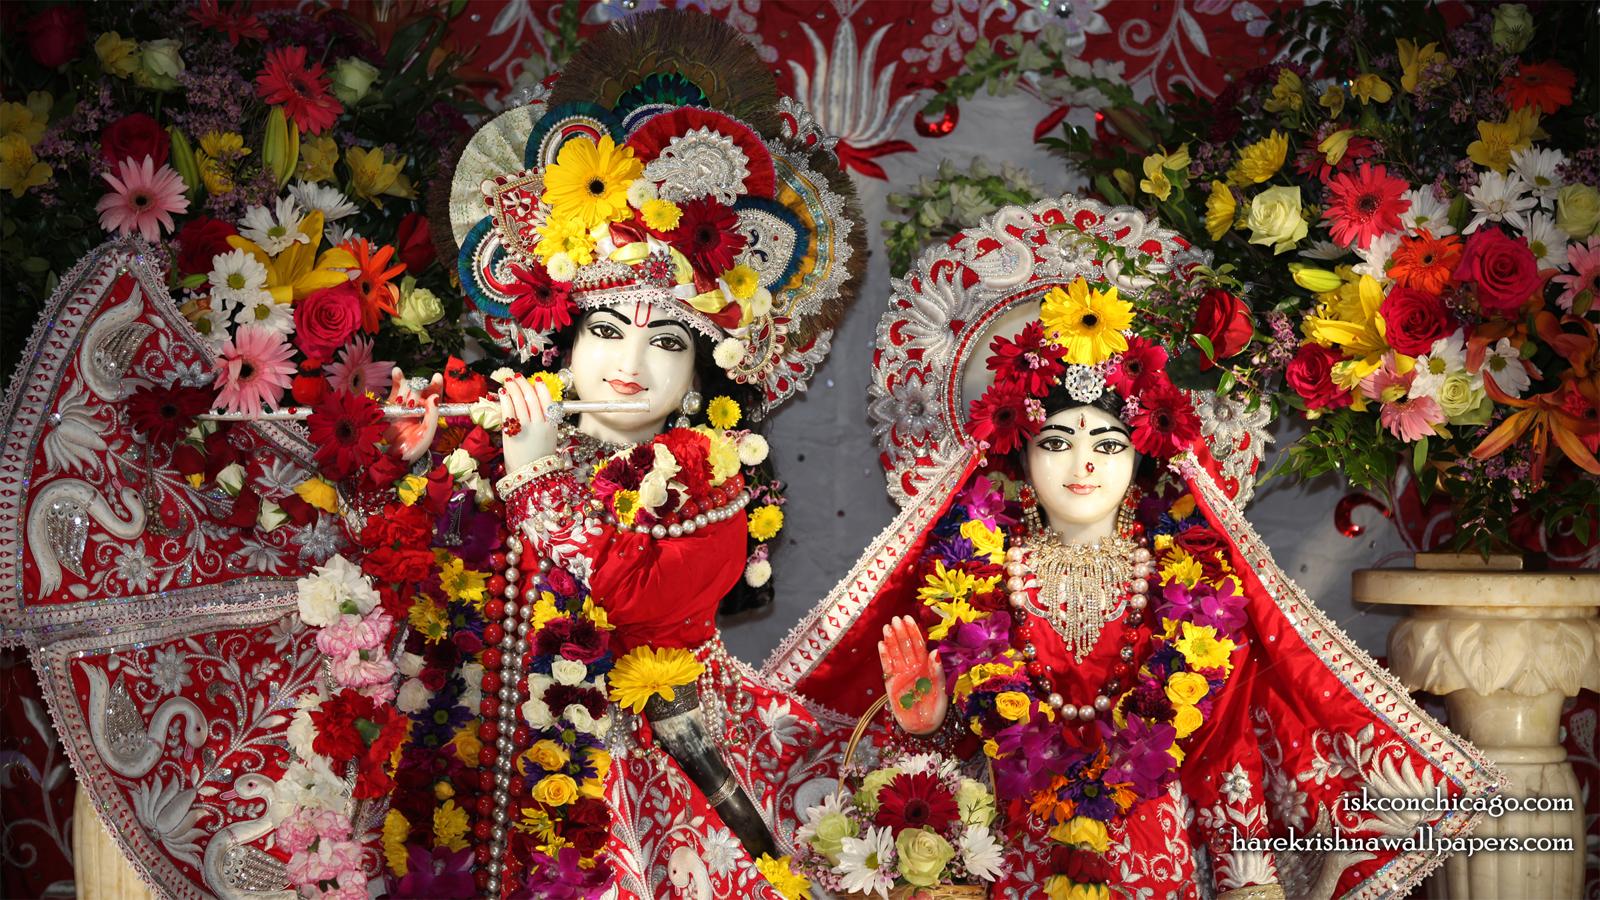 Sri Sri Kishore Kishori Close up Wallpaper (014) Size 1600x900 Download